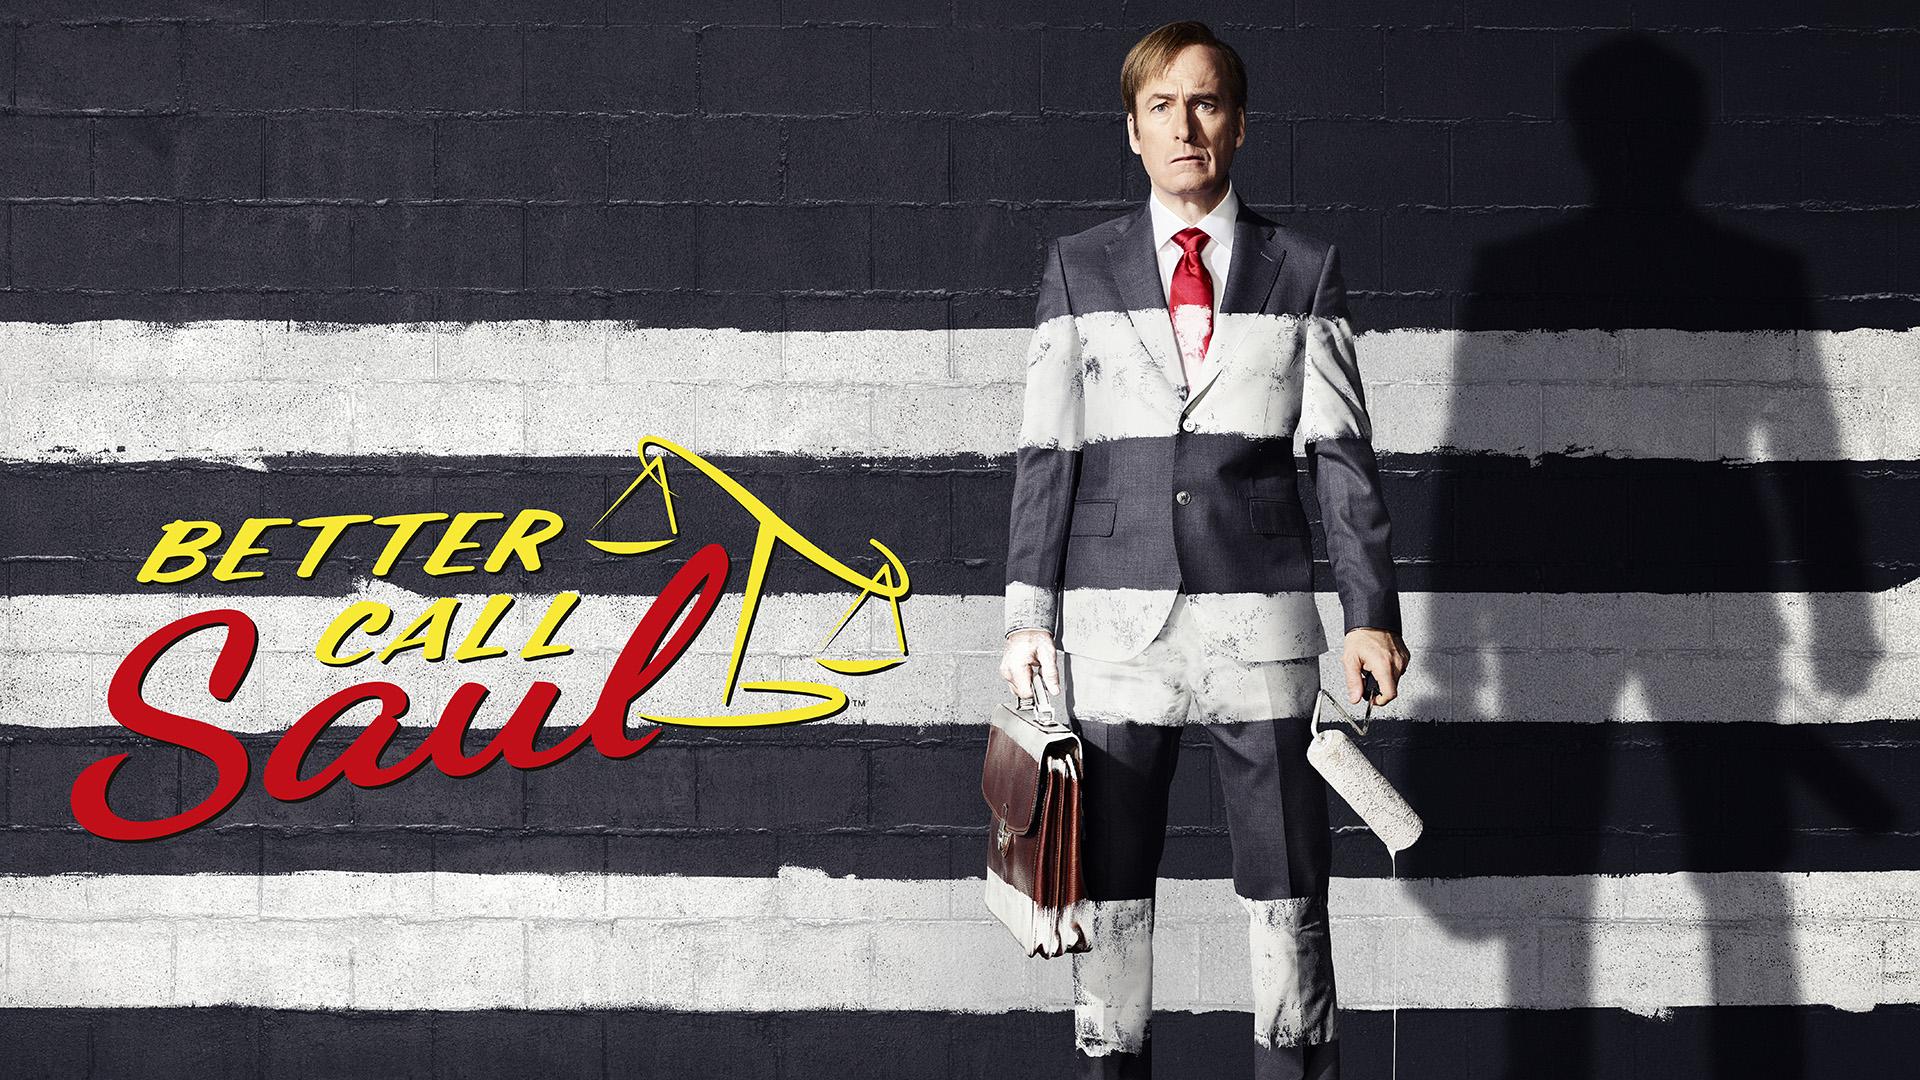 Watch Better Call Saul Online | Season 1 - 4 on Lightbox